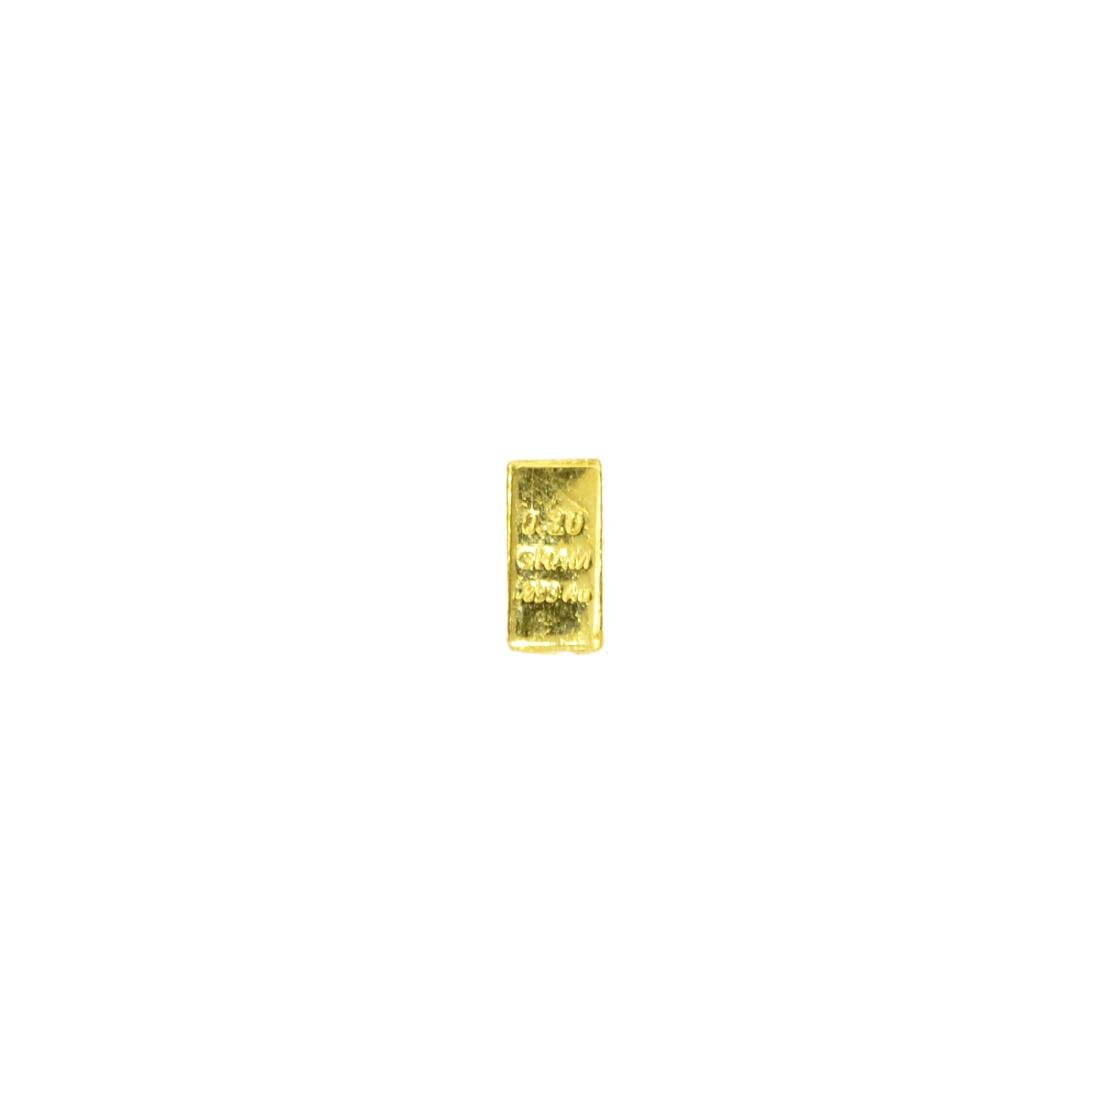 0.10 (1/10) Gram .999 Fine Gold Bar - 2